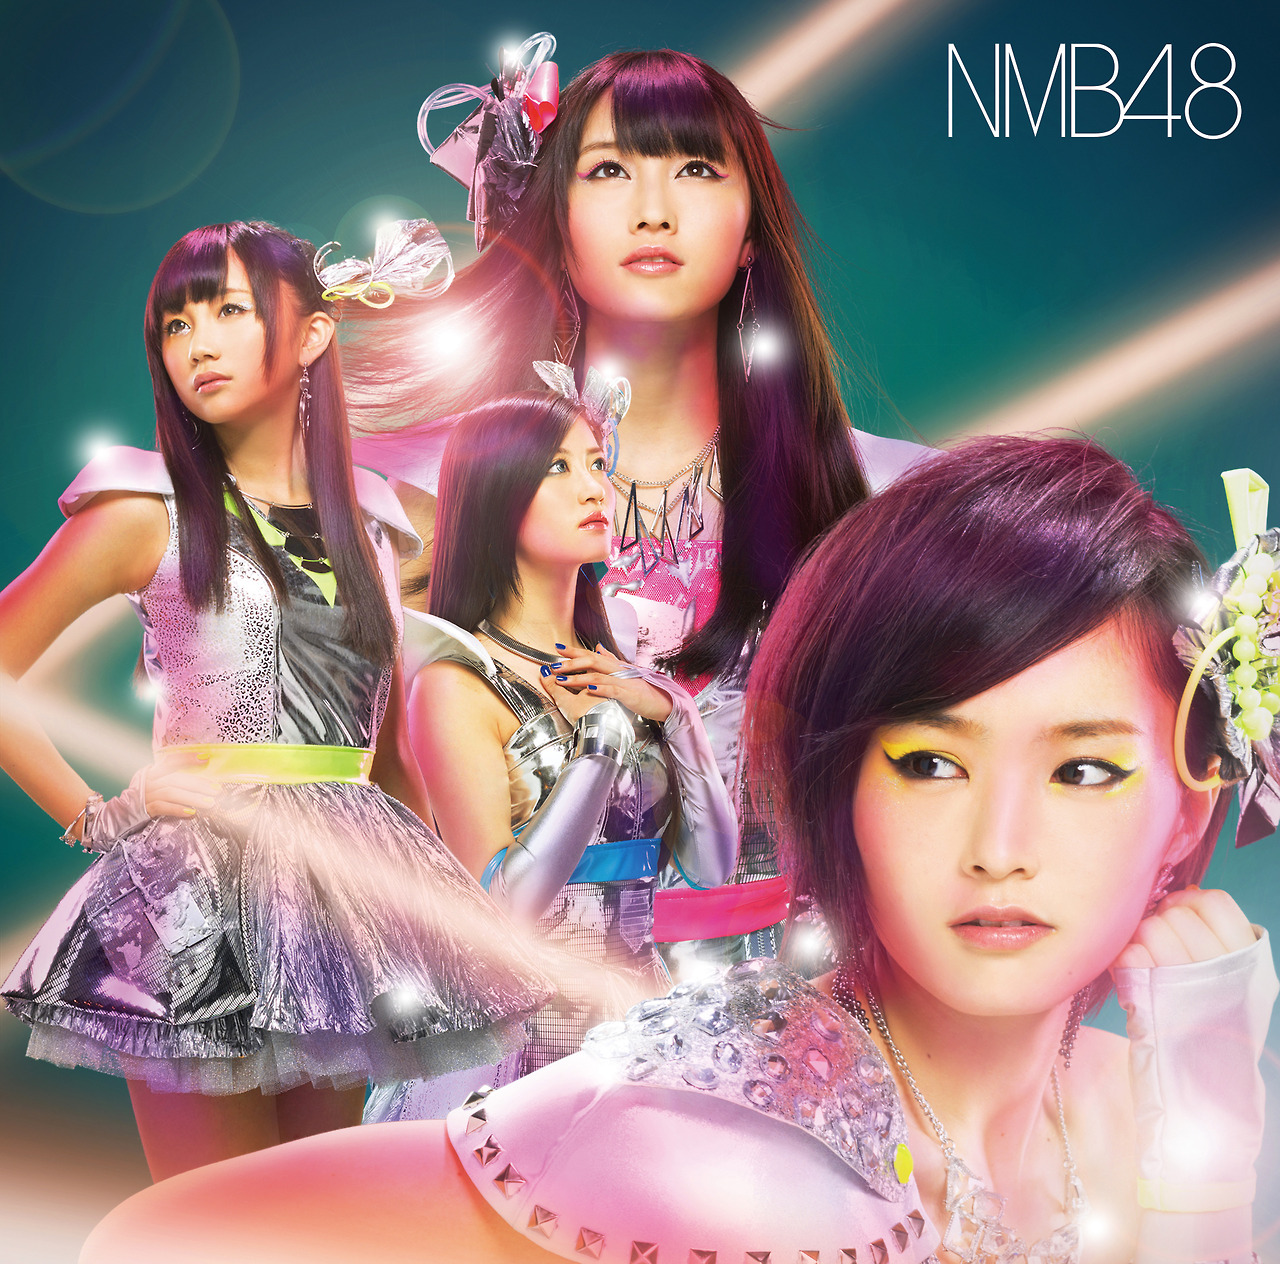 NMB48's 8th single: Kamonegix